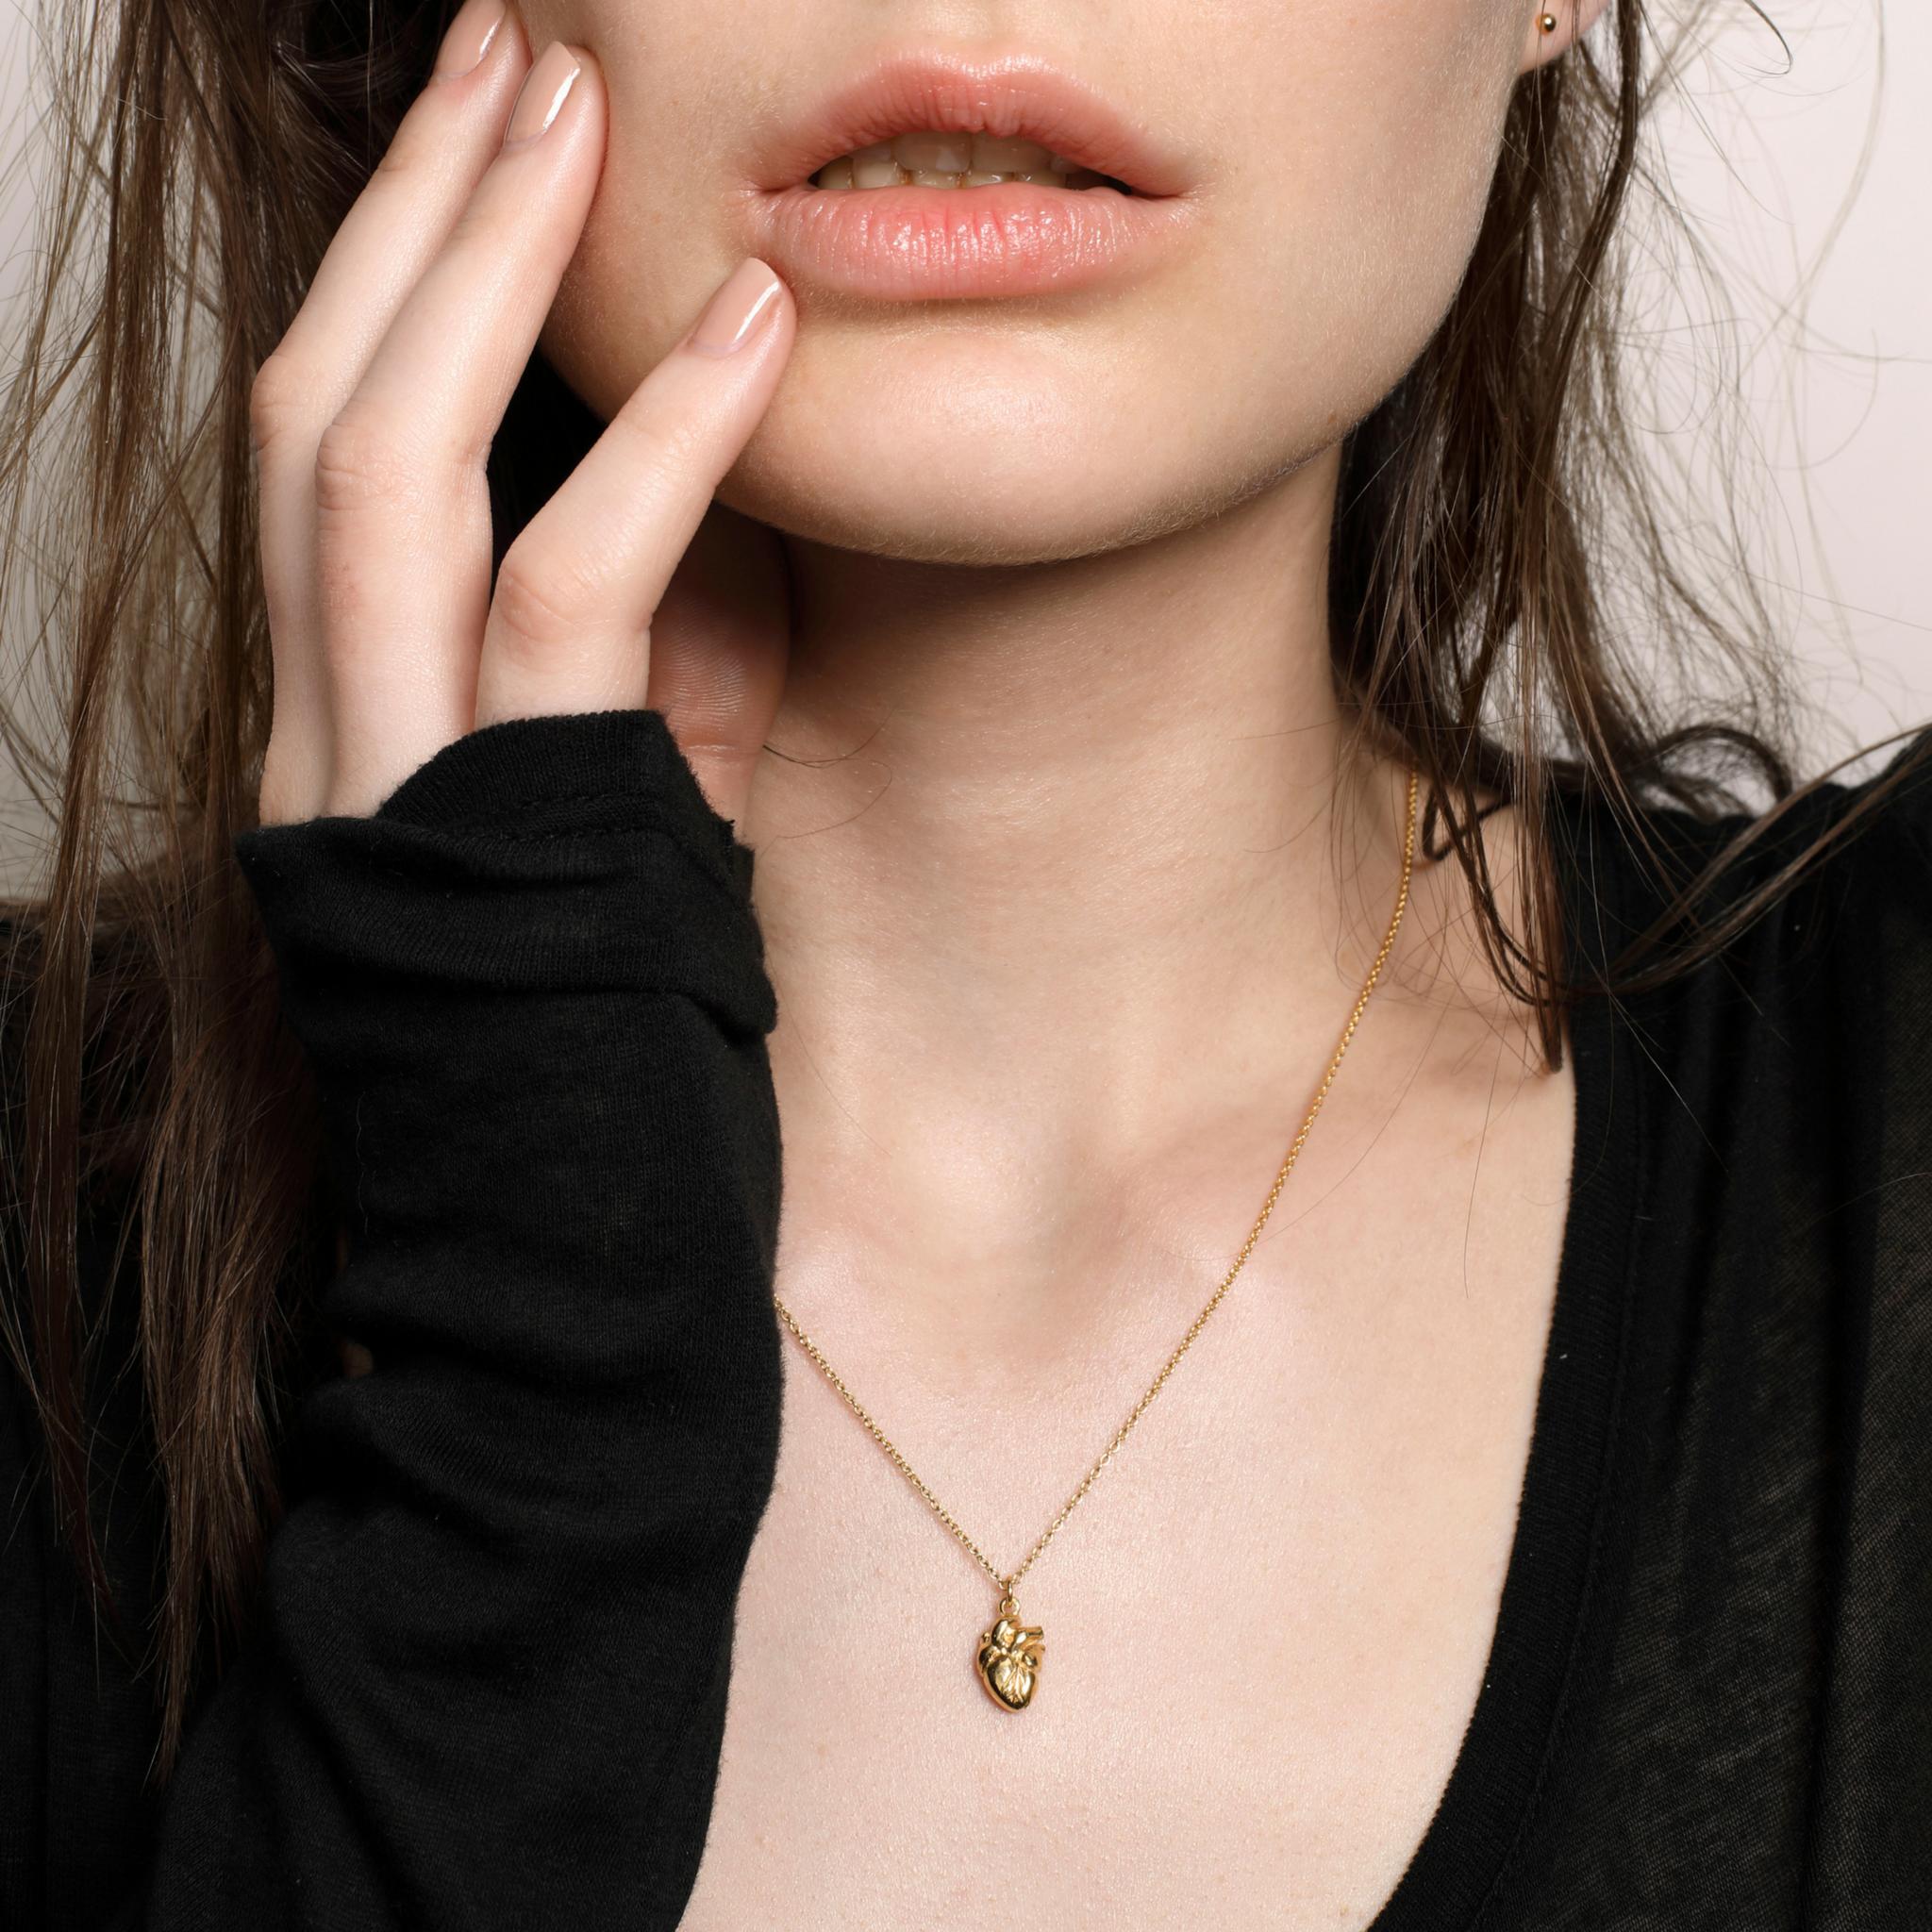 Cadence London heart necklace